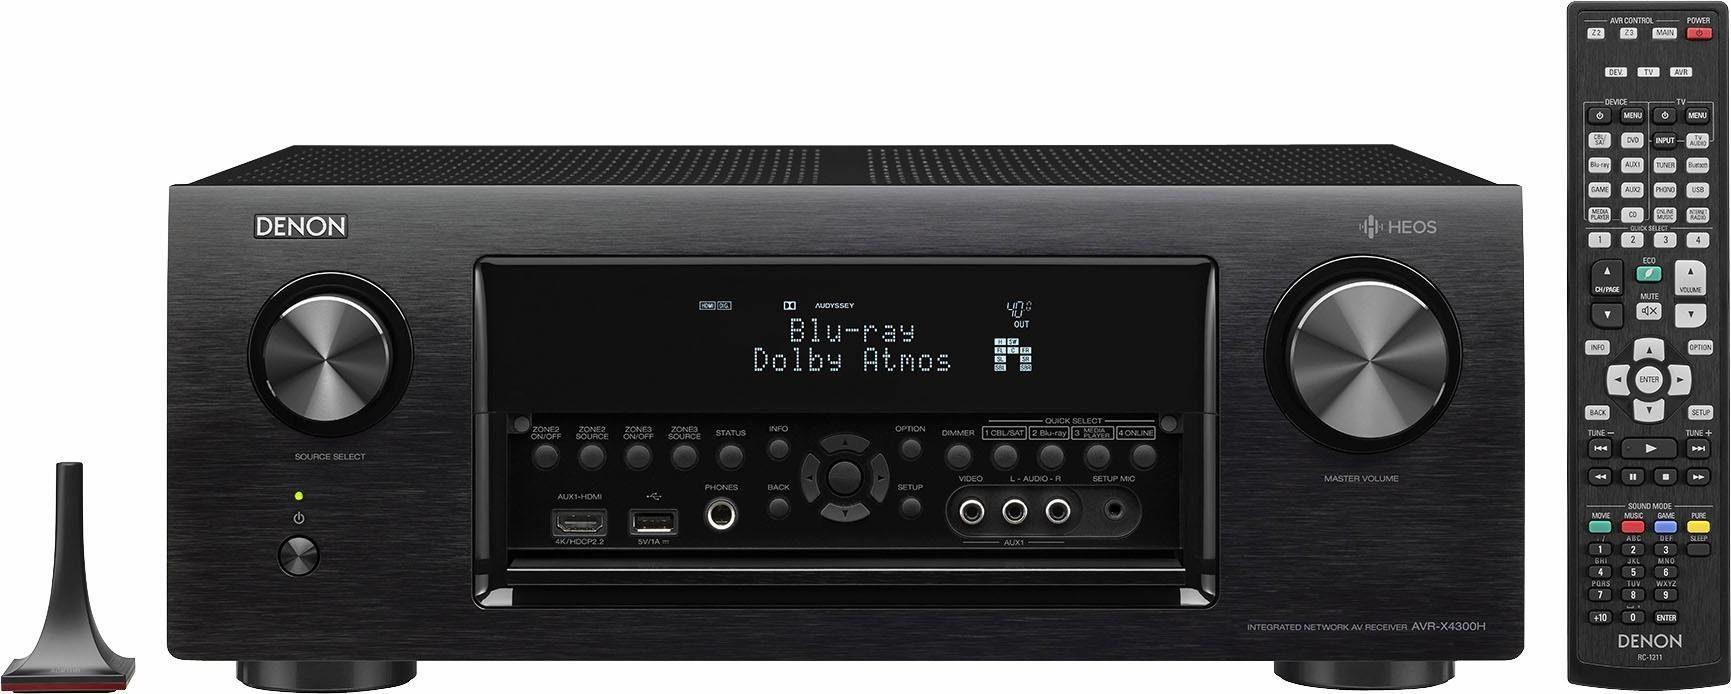 Heos by Denon AVR-X4300H 11.2 AV-Receiver (Hi-Res, Spotify, Airplay, WLAN)